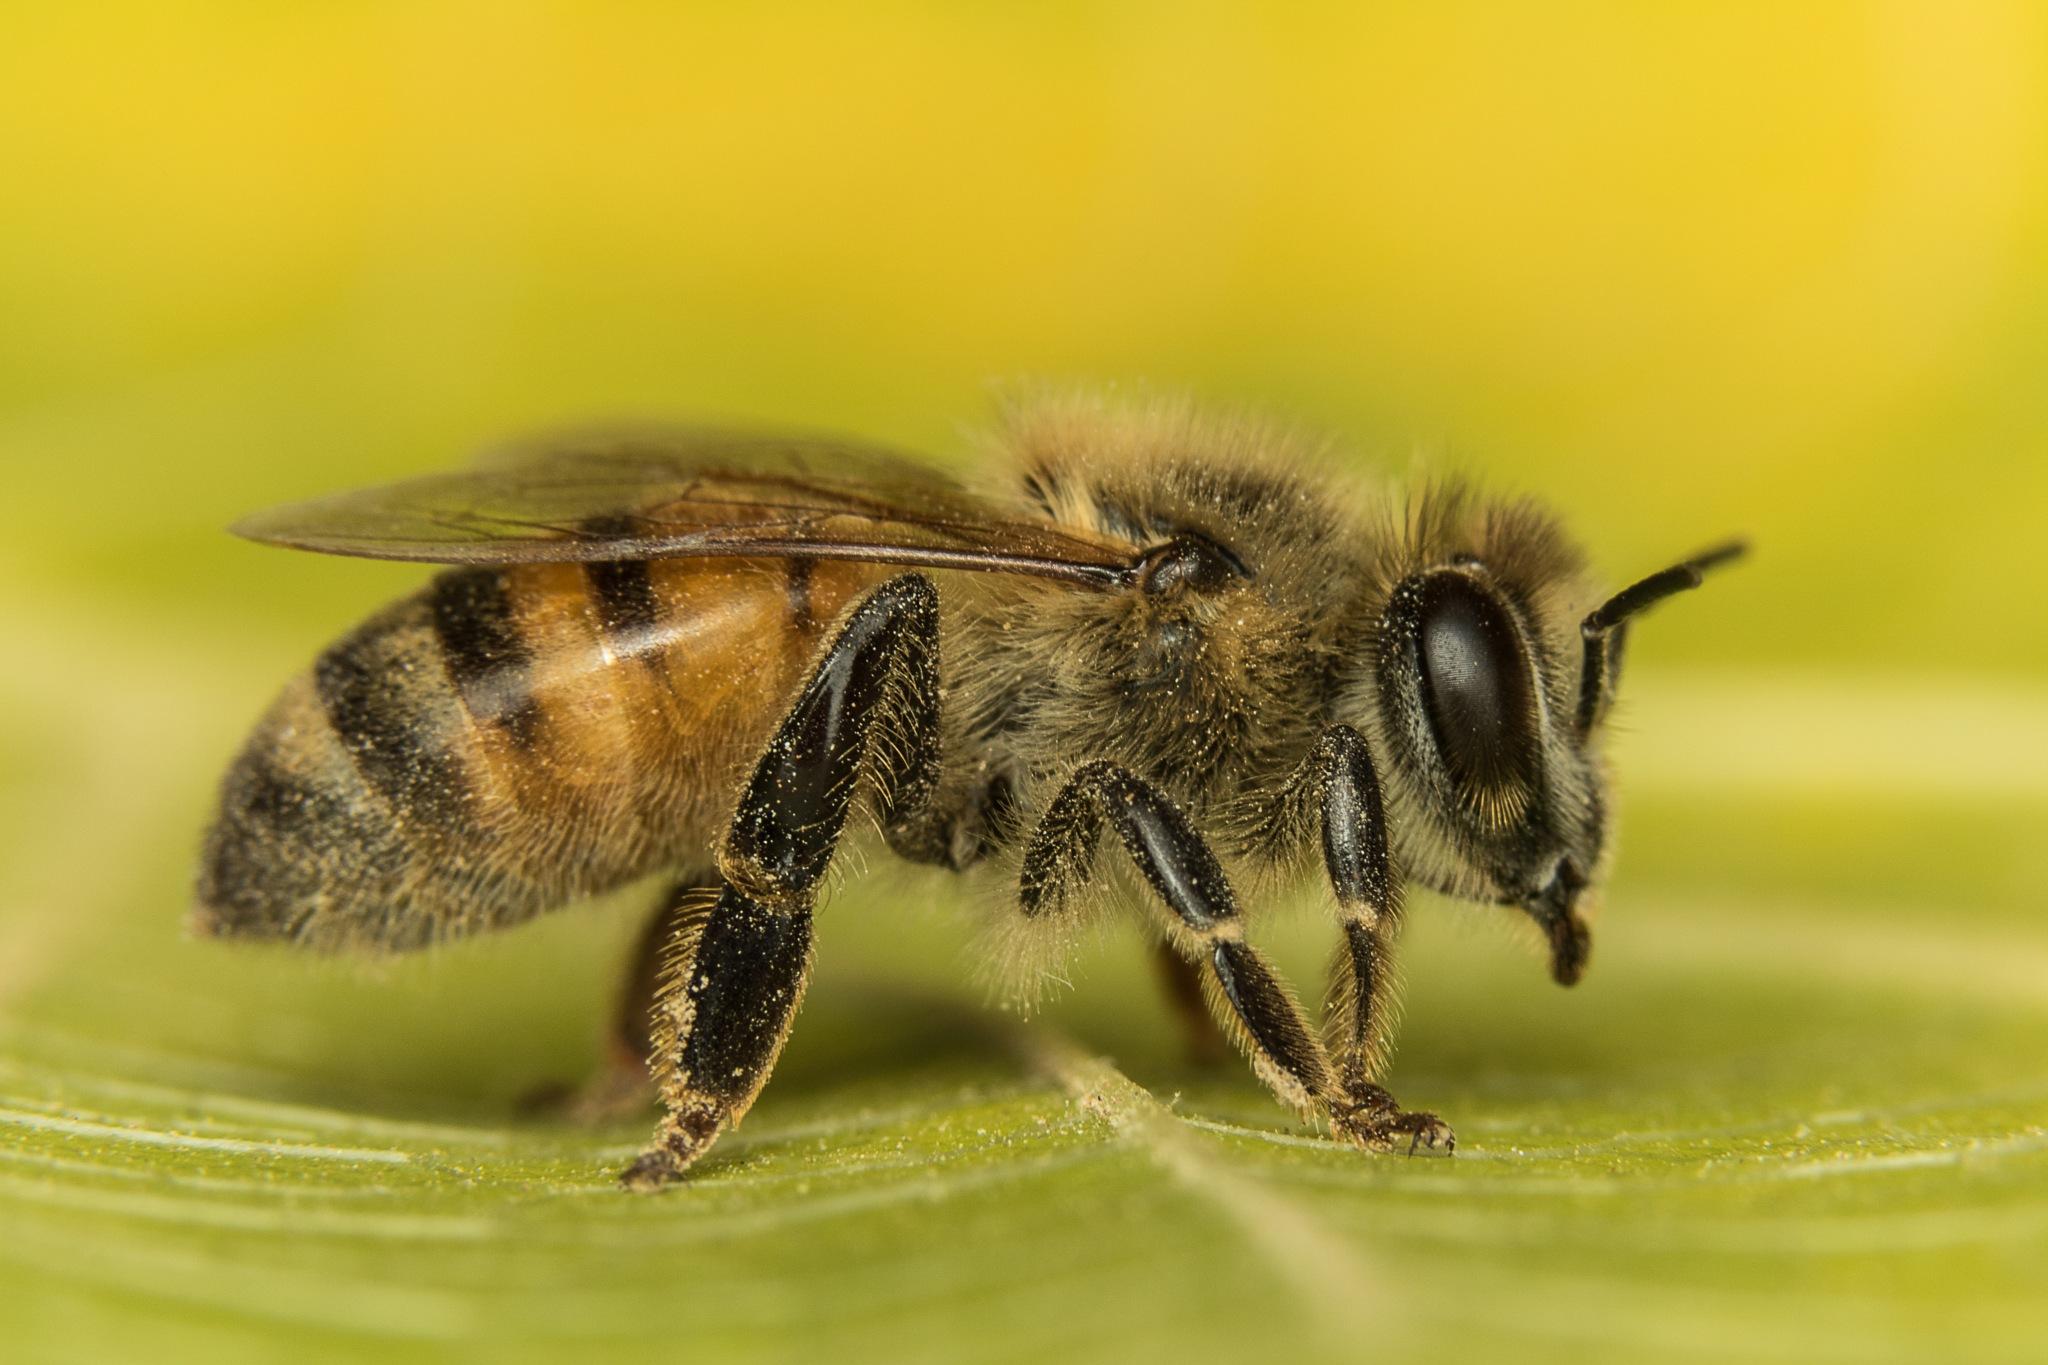 Honey bee by ALSMADI AHMAD